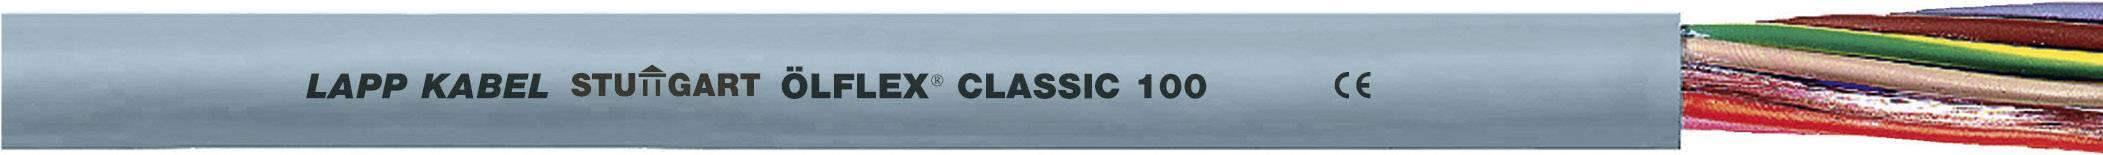 Kabel LappKabel Ölflex CLASSIC 100 3G10 (0010301), PVC, 15,9 mm, 750 V, šedá, 1000 m